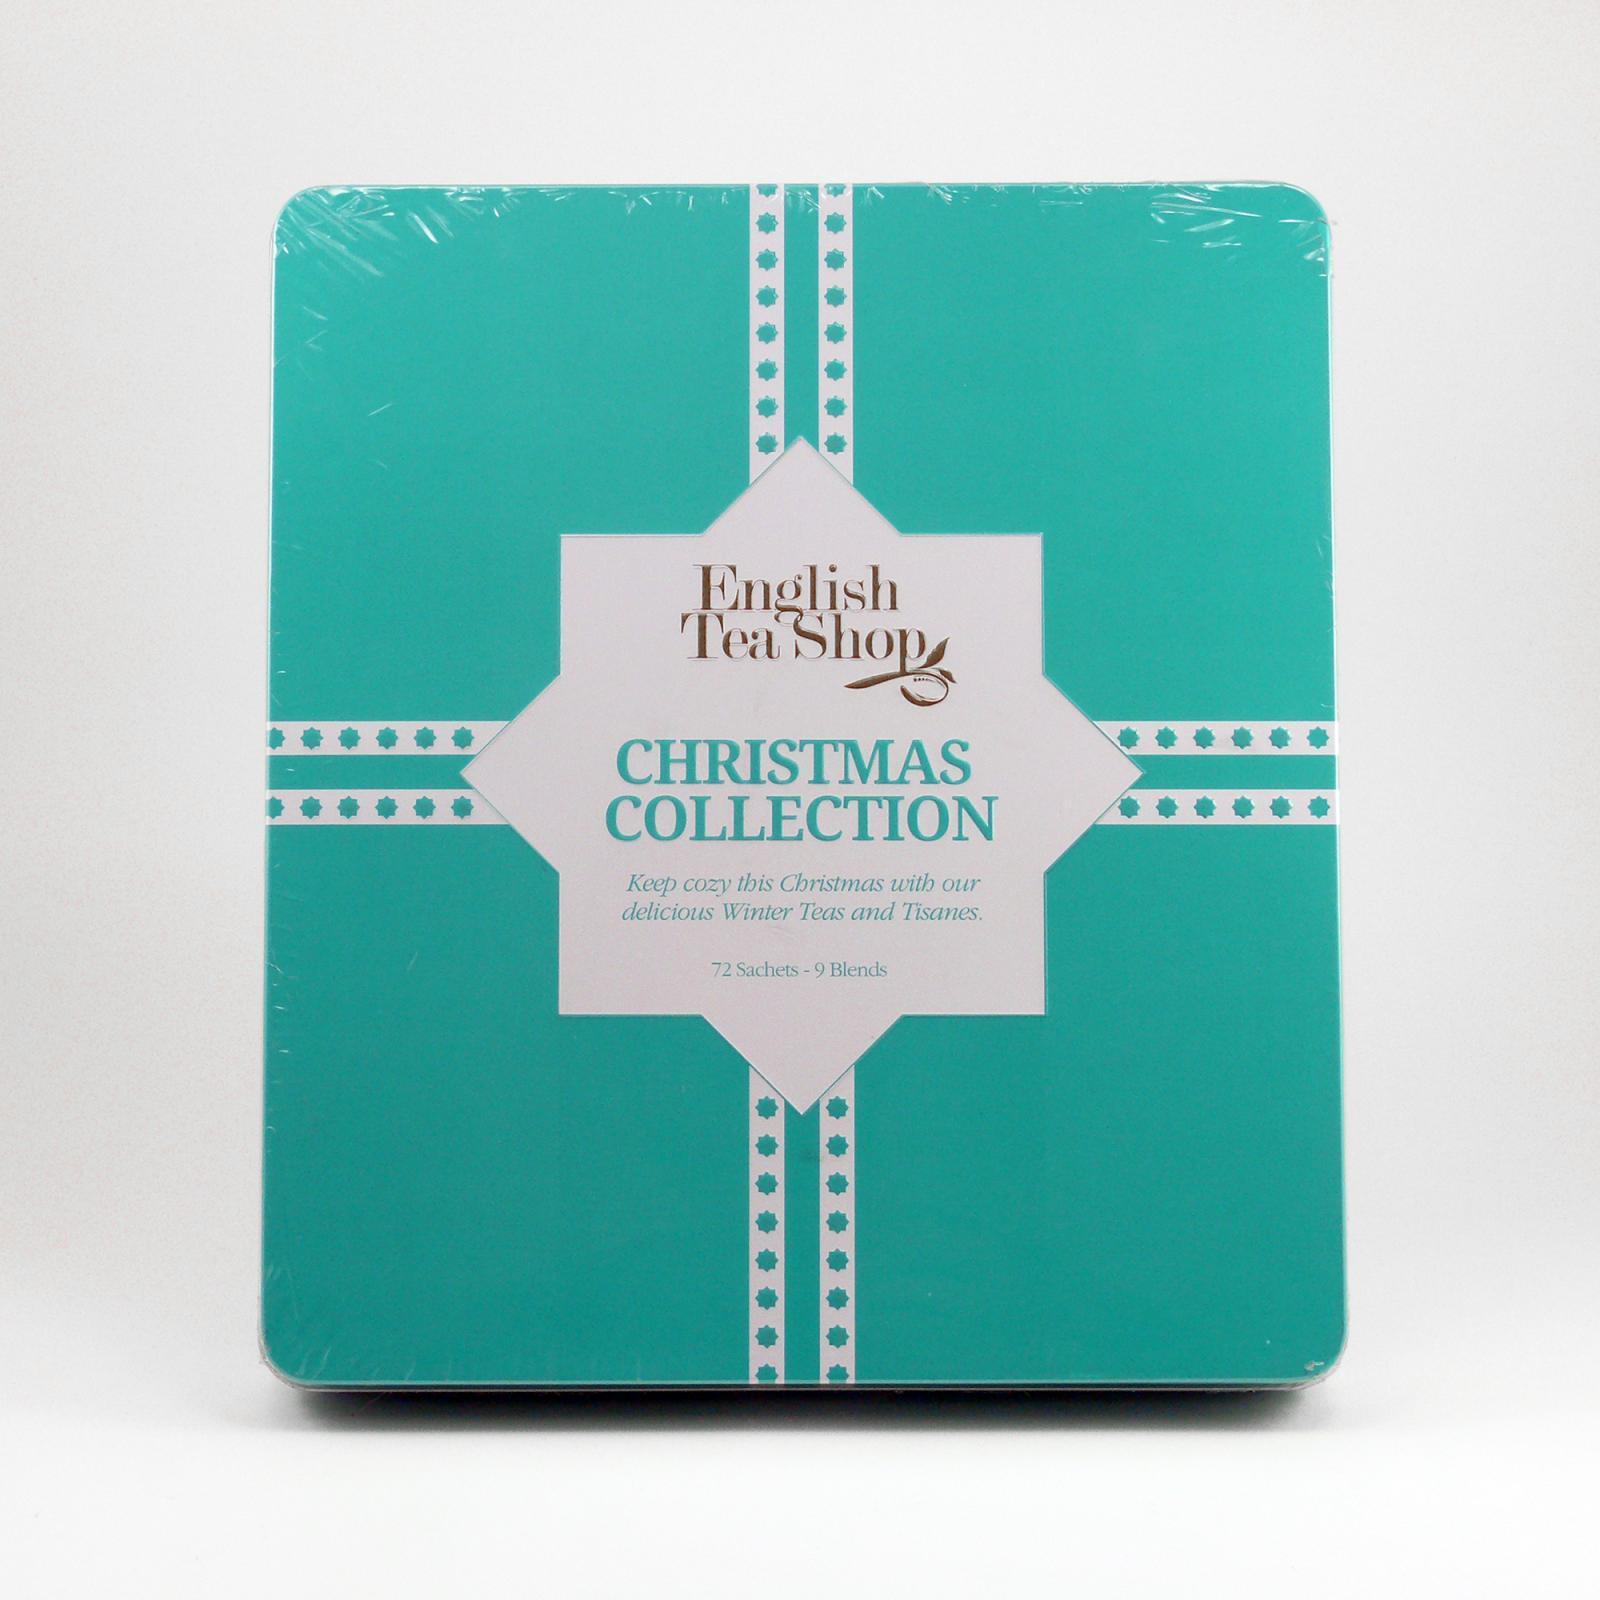 English Tea Shop Modré Vánoce, plechová kazeta 72 ks, 108 g